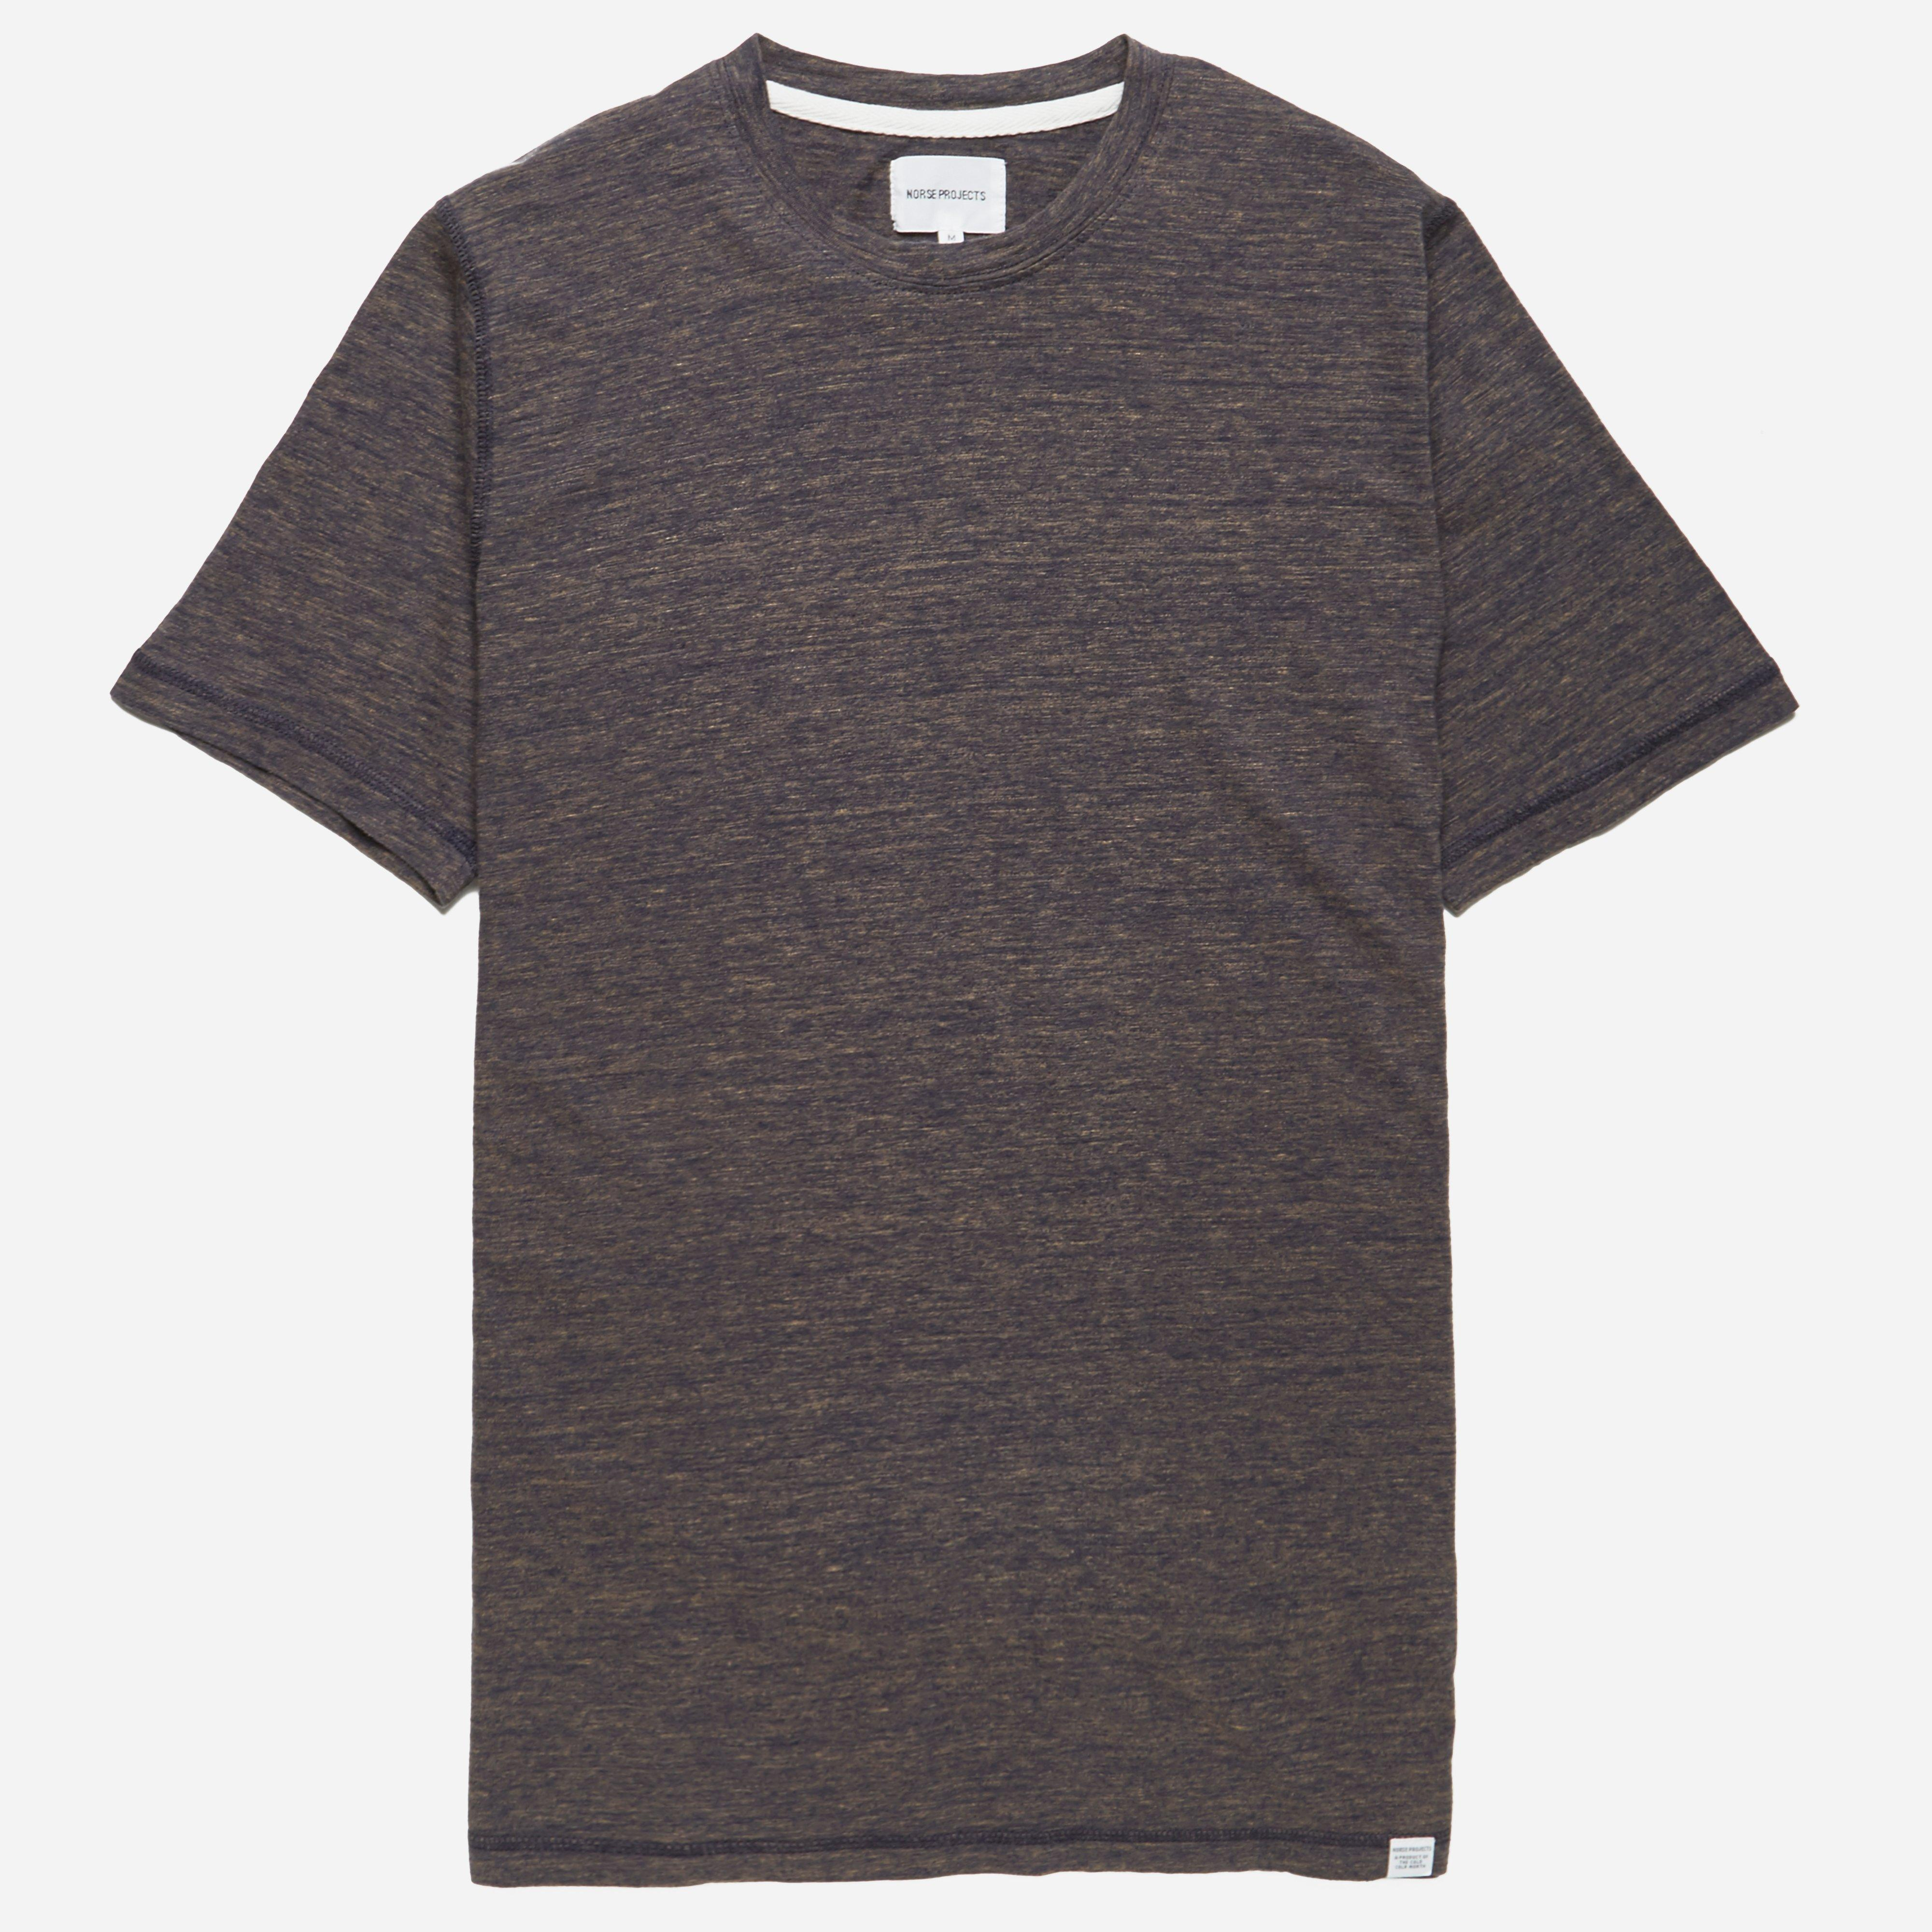 Norse Projects James Contrast Melange T-shirt